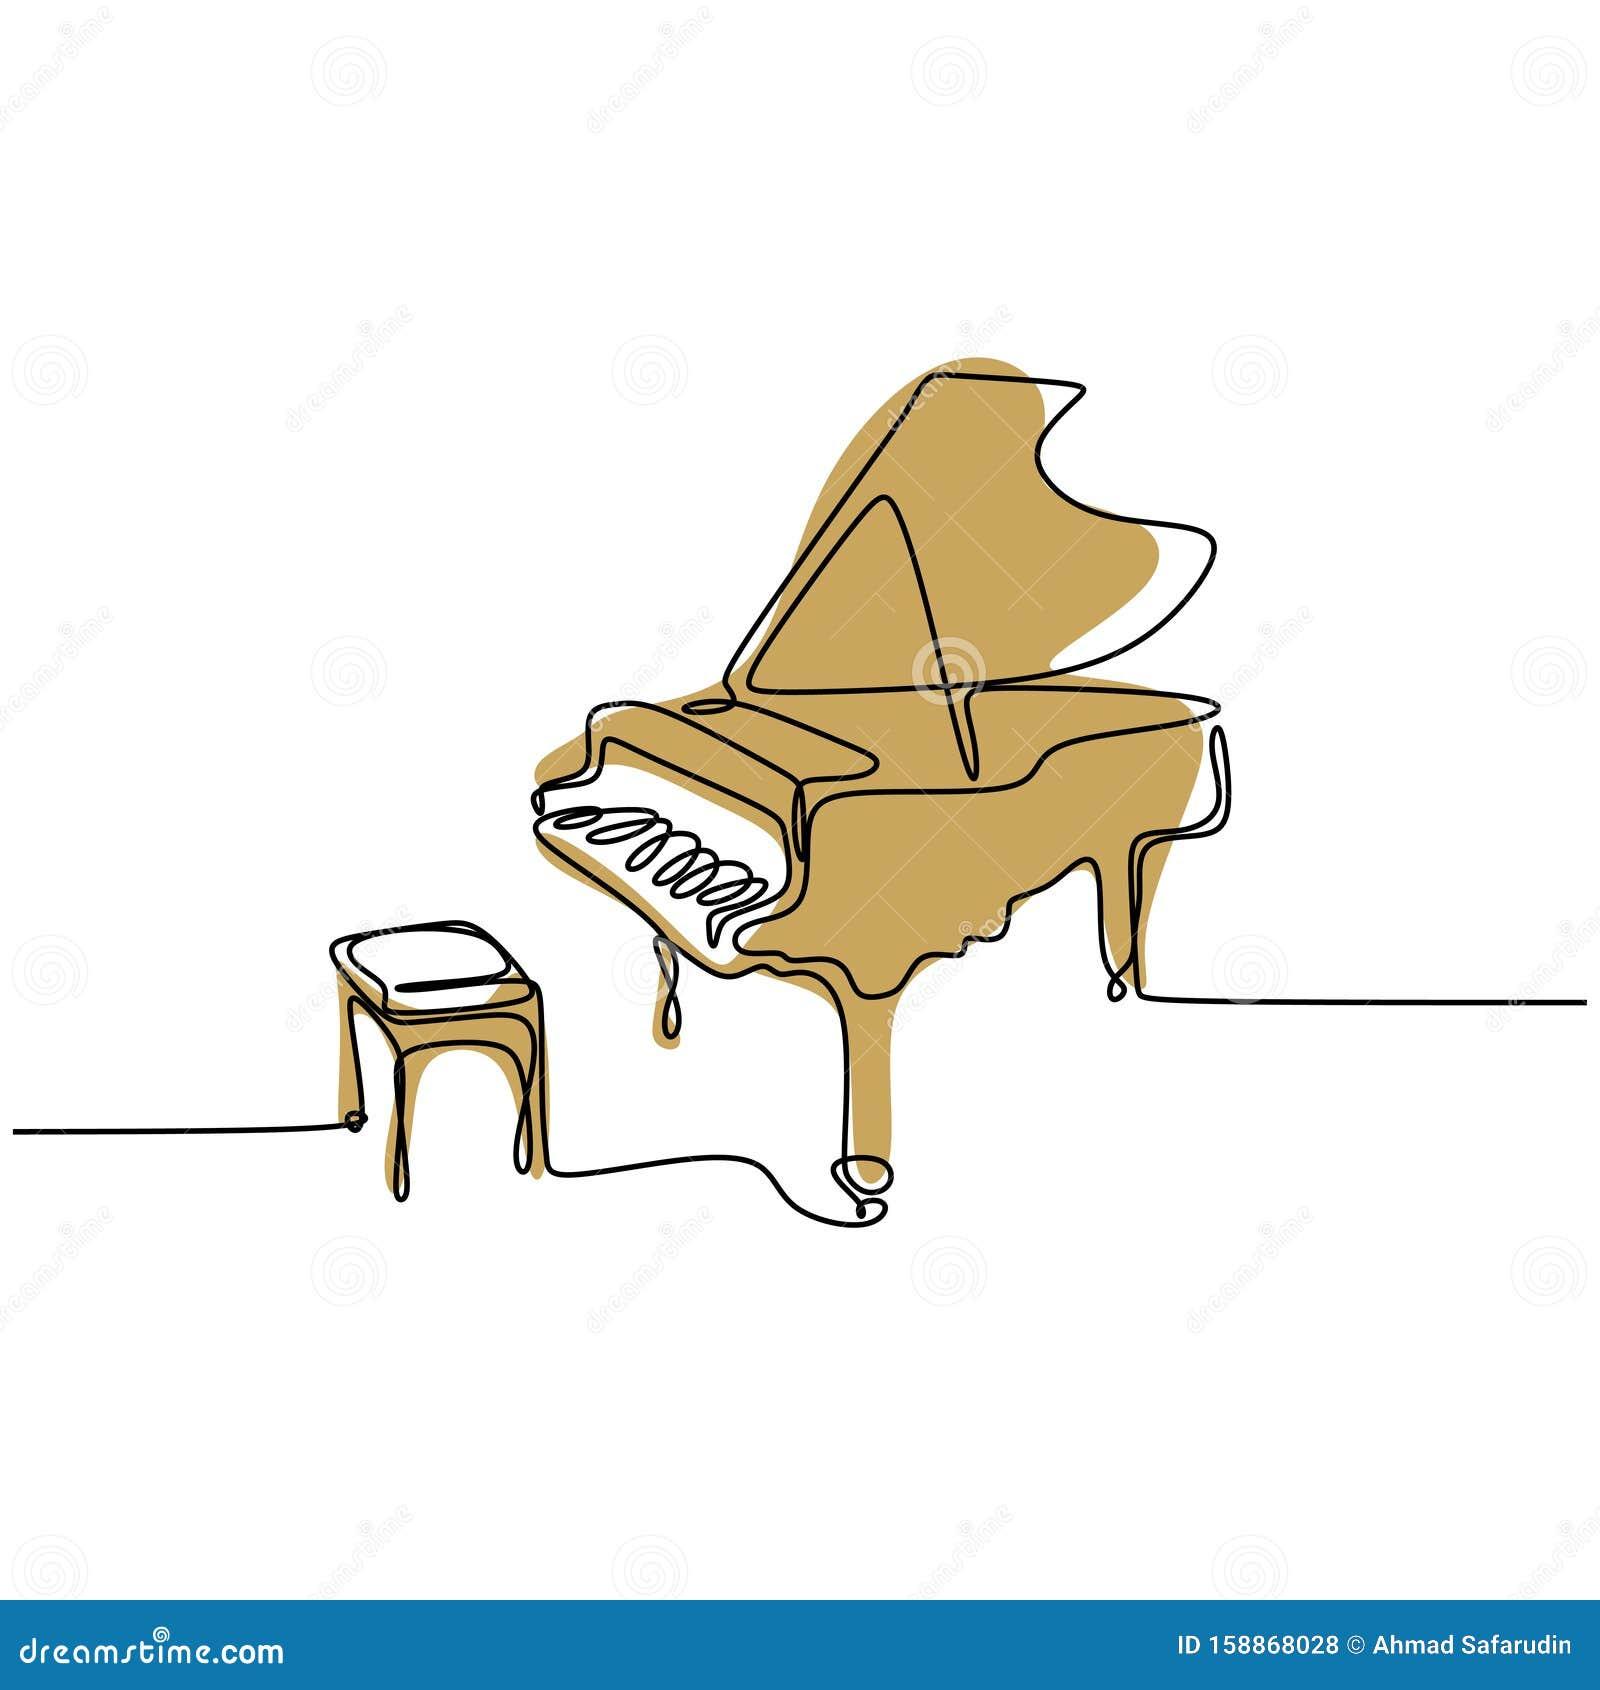 Vintage Piano Keyboard Music Clipart  Border Lineart Illustration Instant Download PNG JPG Digi Line Art Image Drawing L457